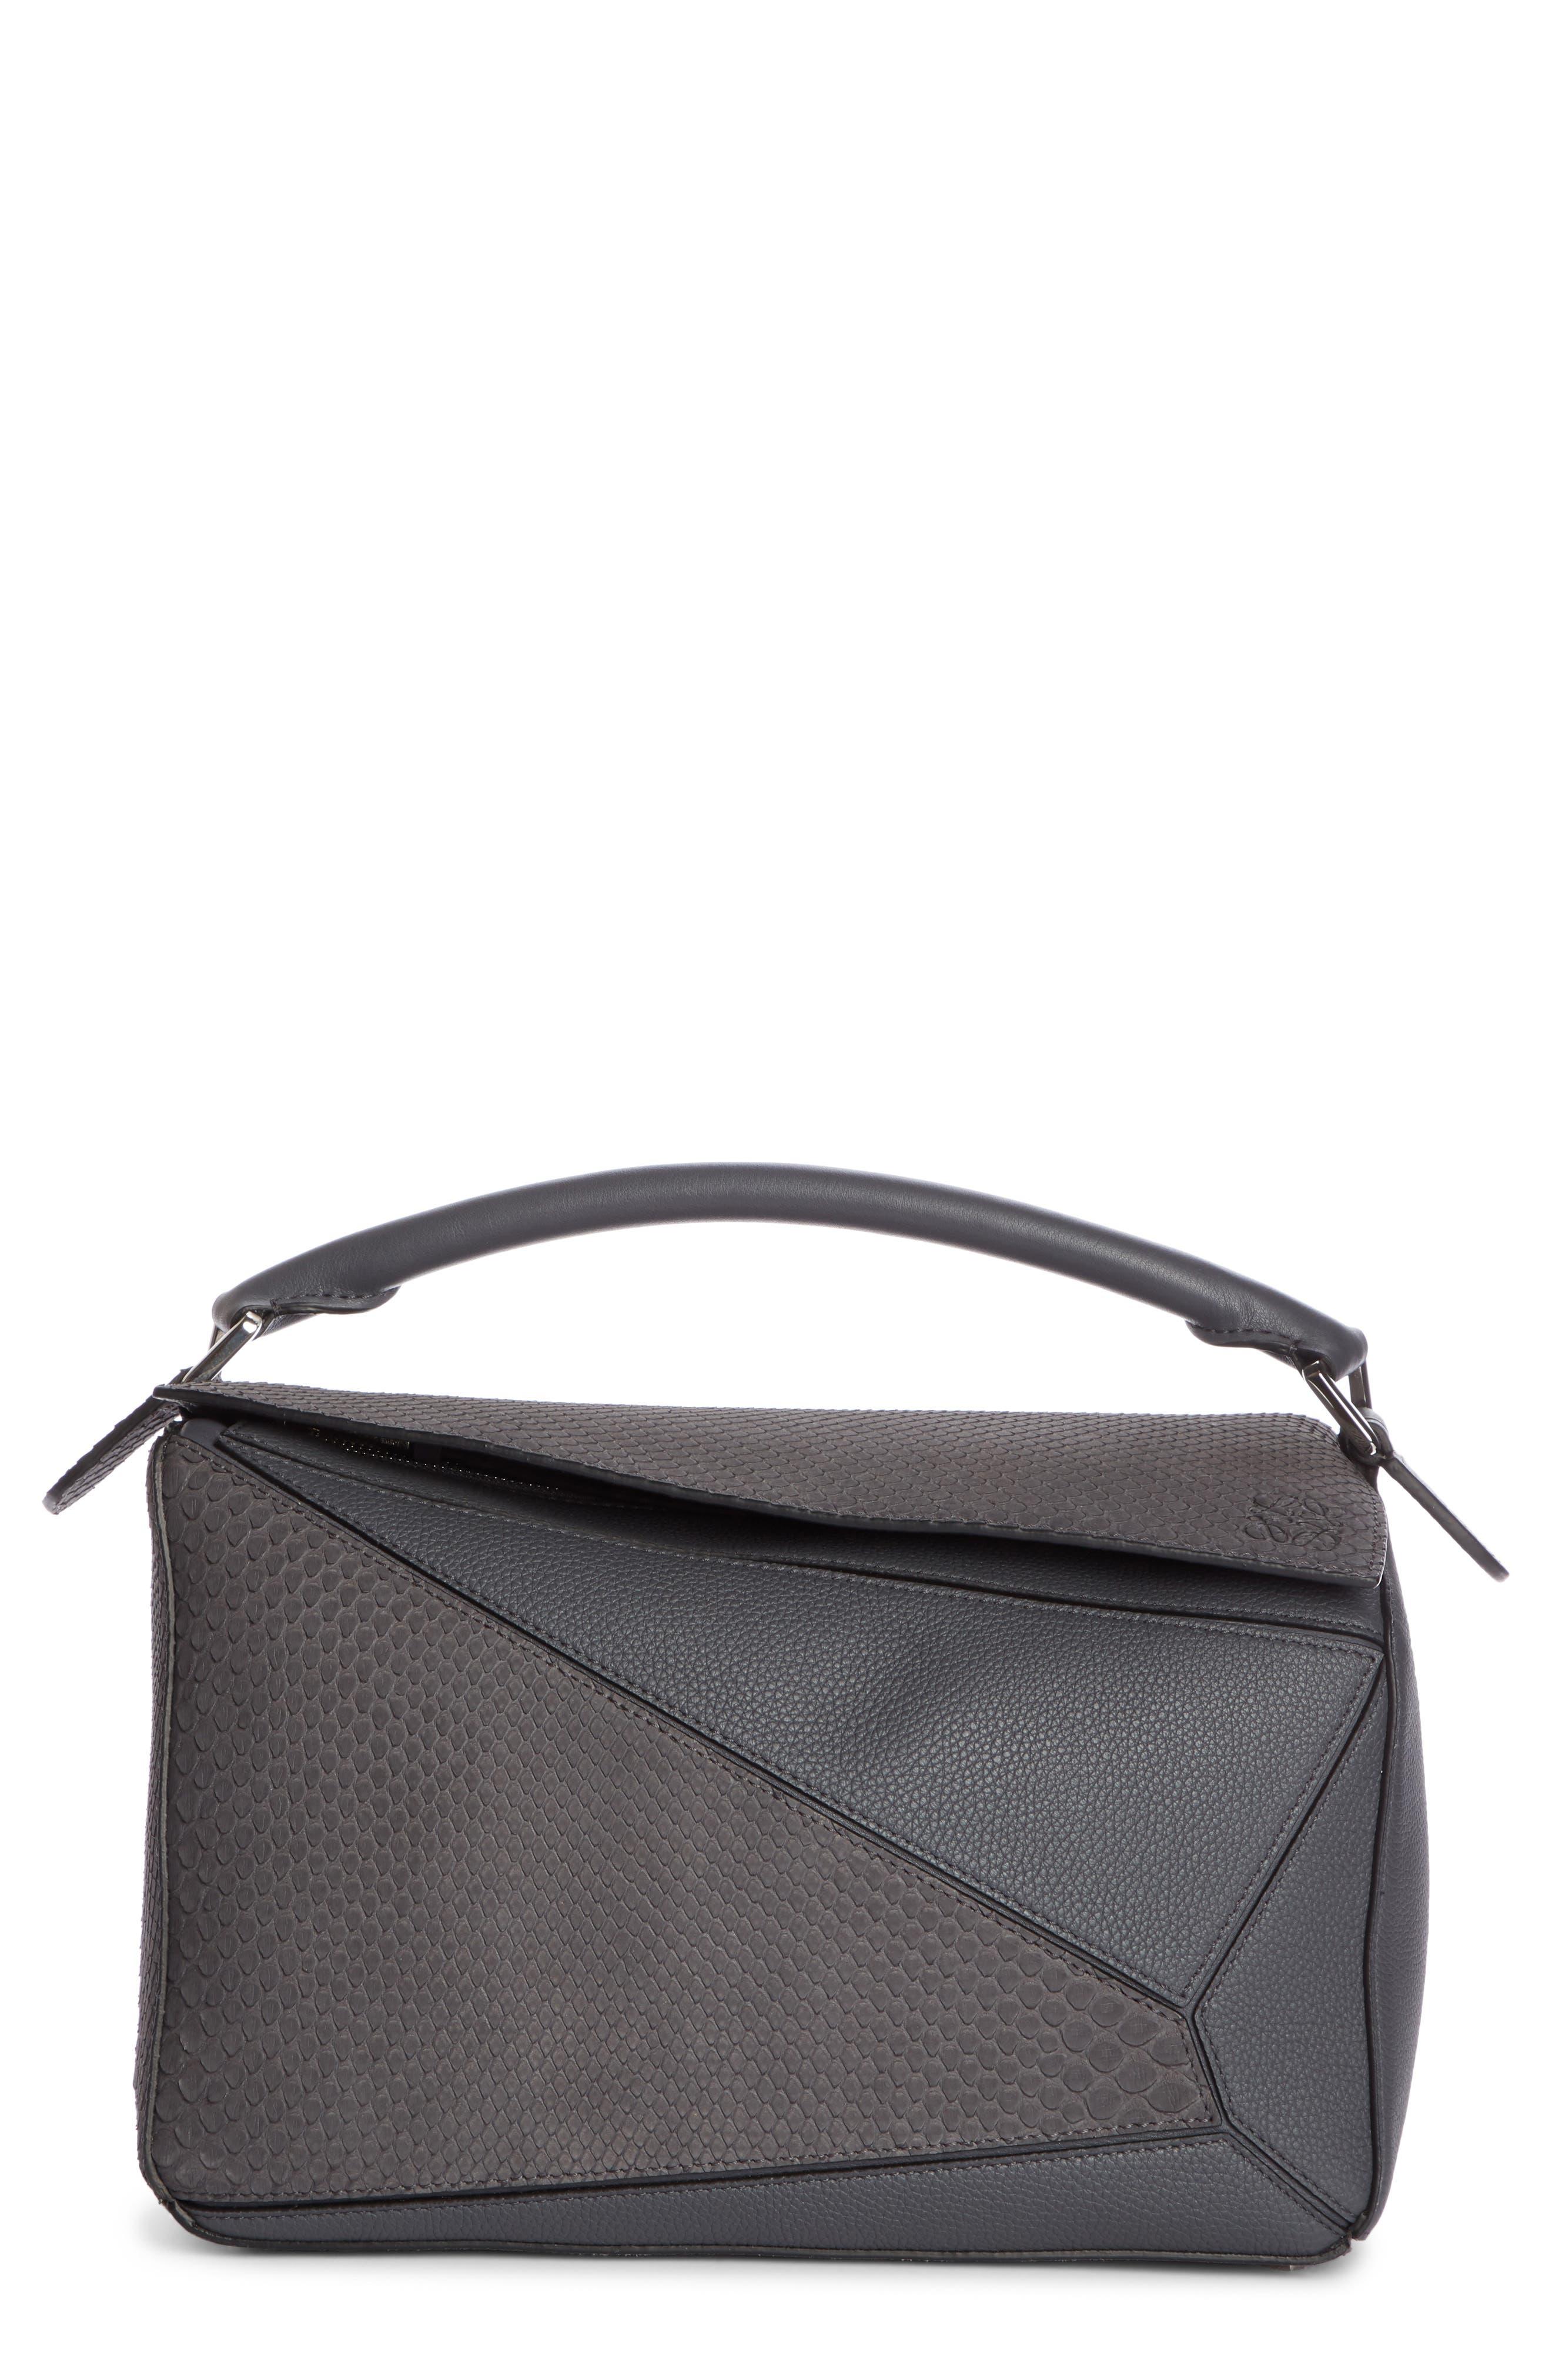 Medium Puzzle Leather Shoulder Bag,                         Main,                         color, ANTHRACITE